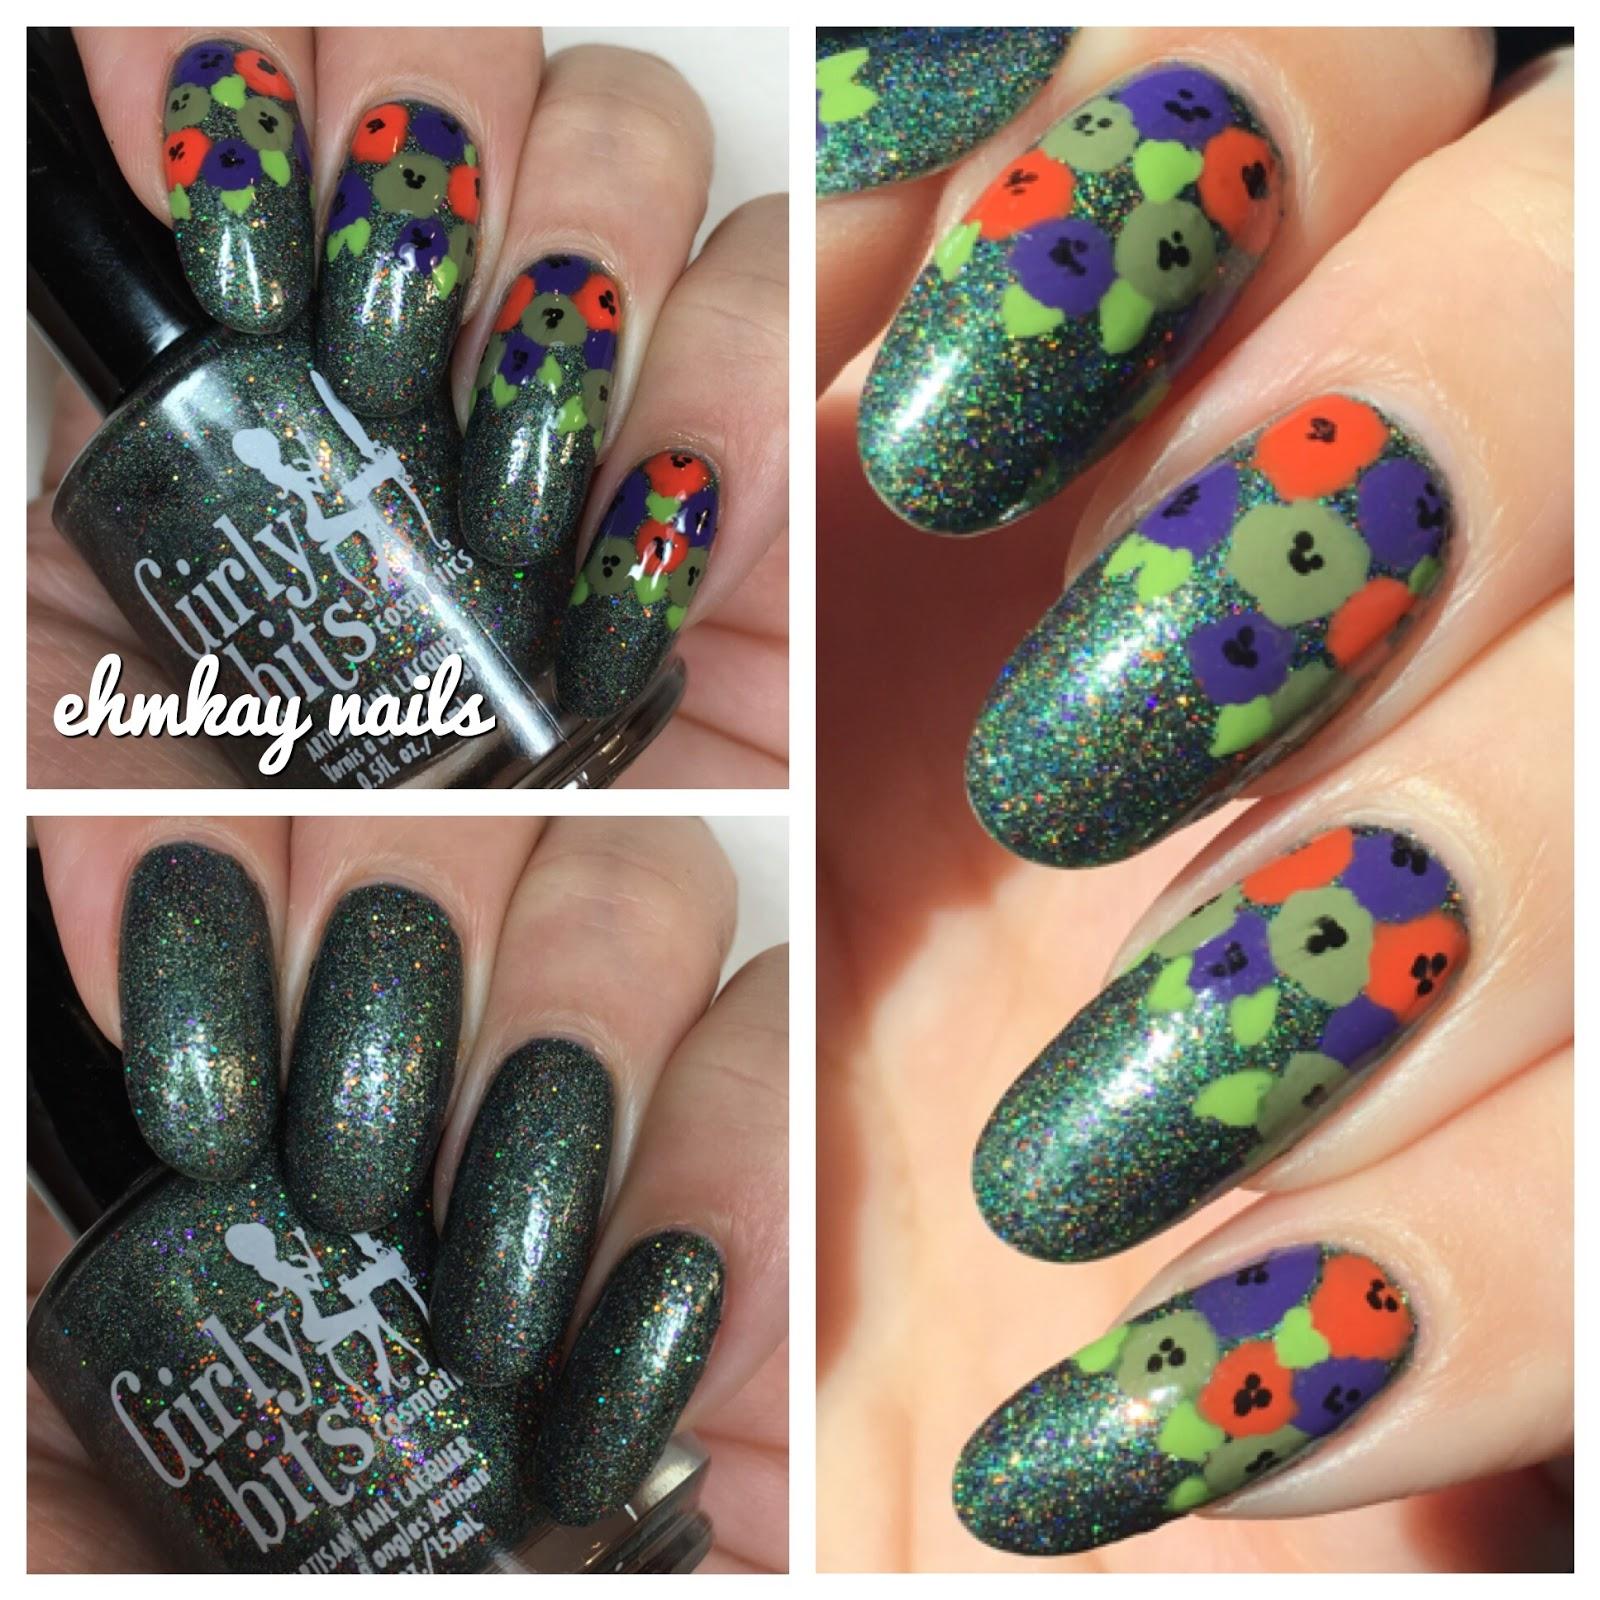 Ehmkay Nails Halloween Nail Art Girly Bits Abracapocus With